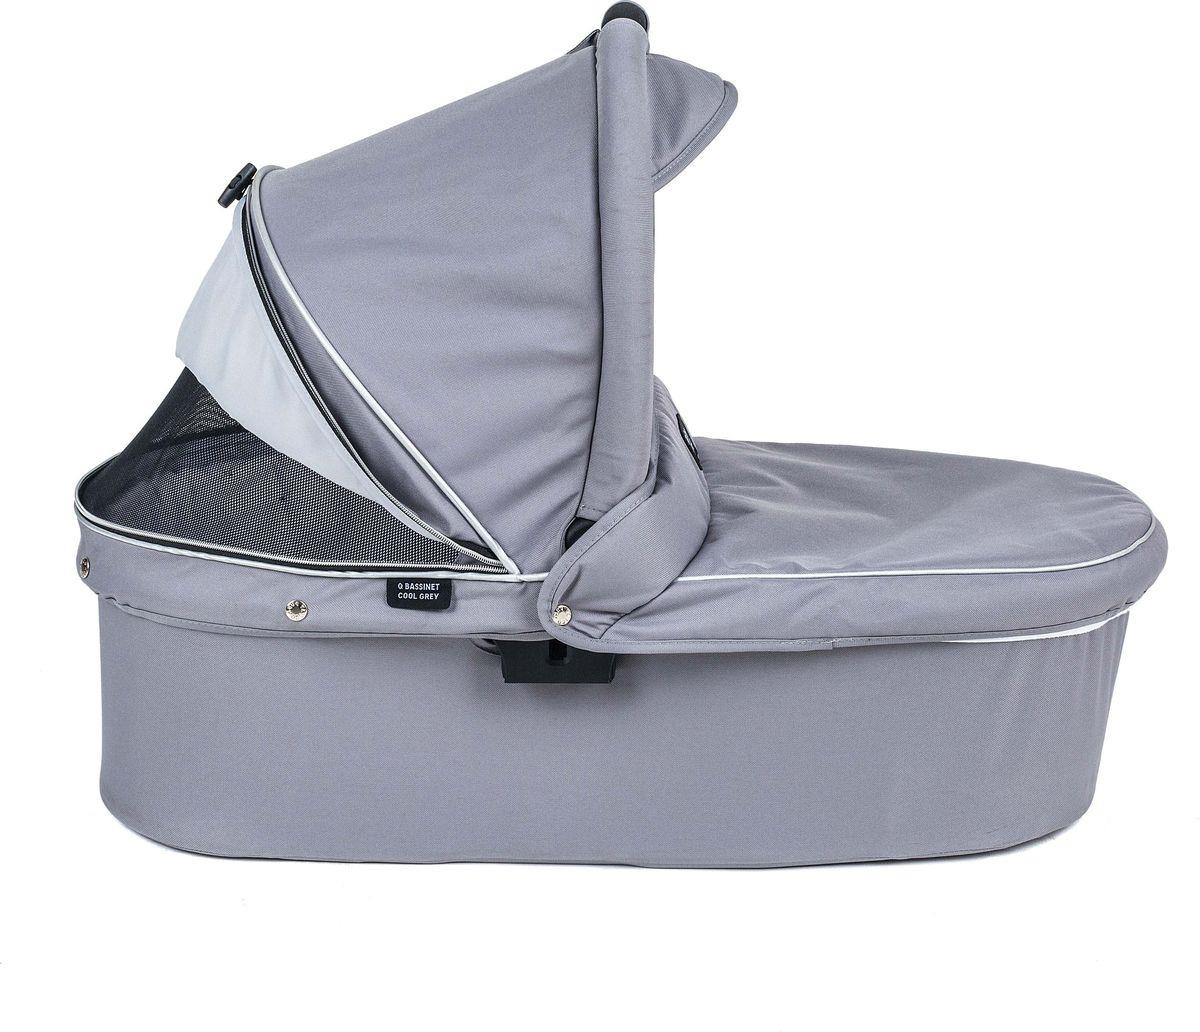 Люлька Valco Baby Q Bassinet для Trimod X, Snap 4 Ultra, Quad X Cool Grey цена